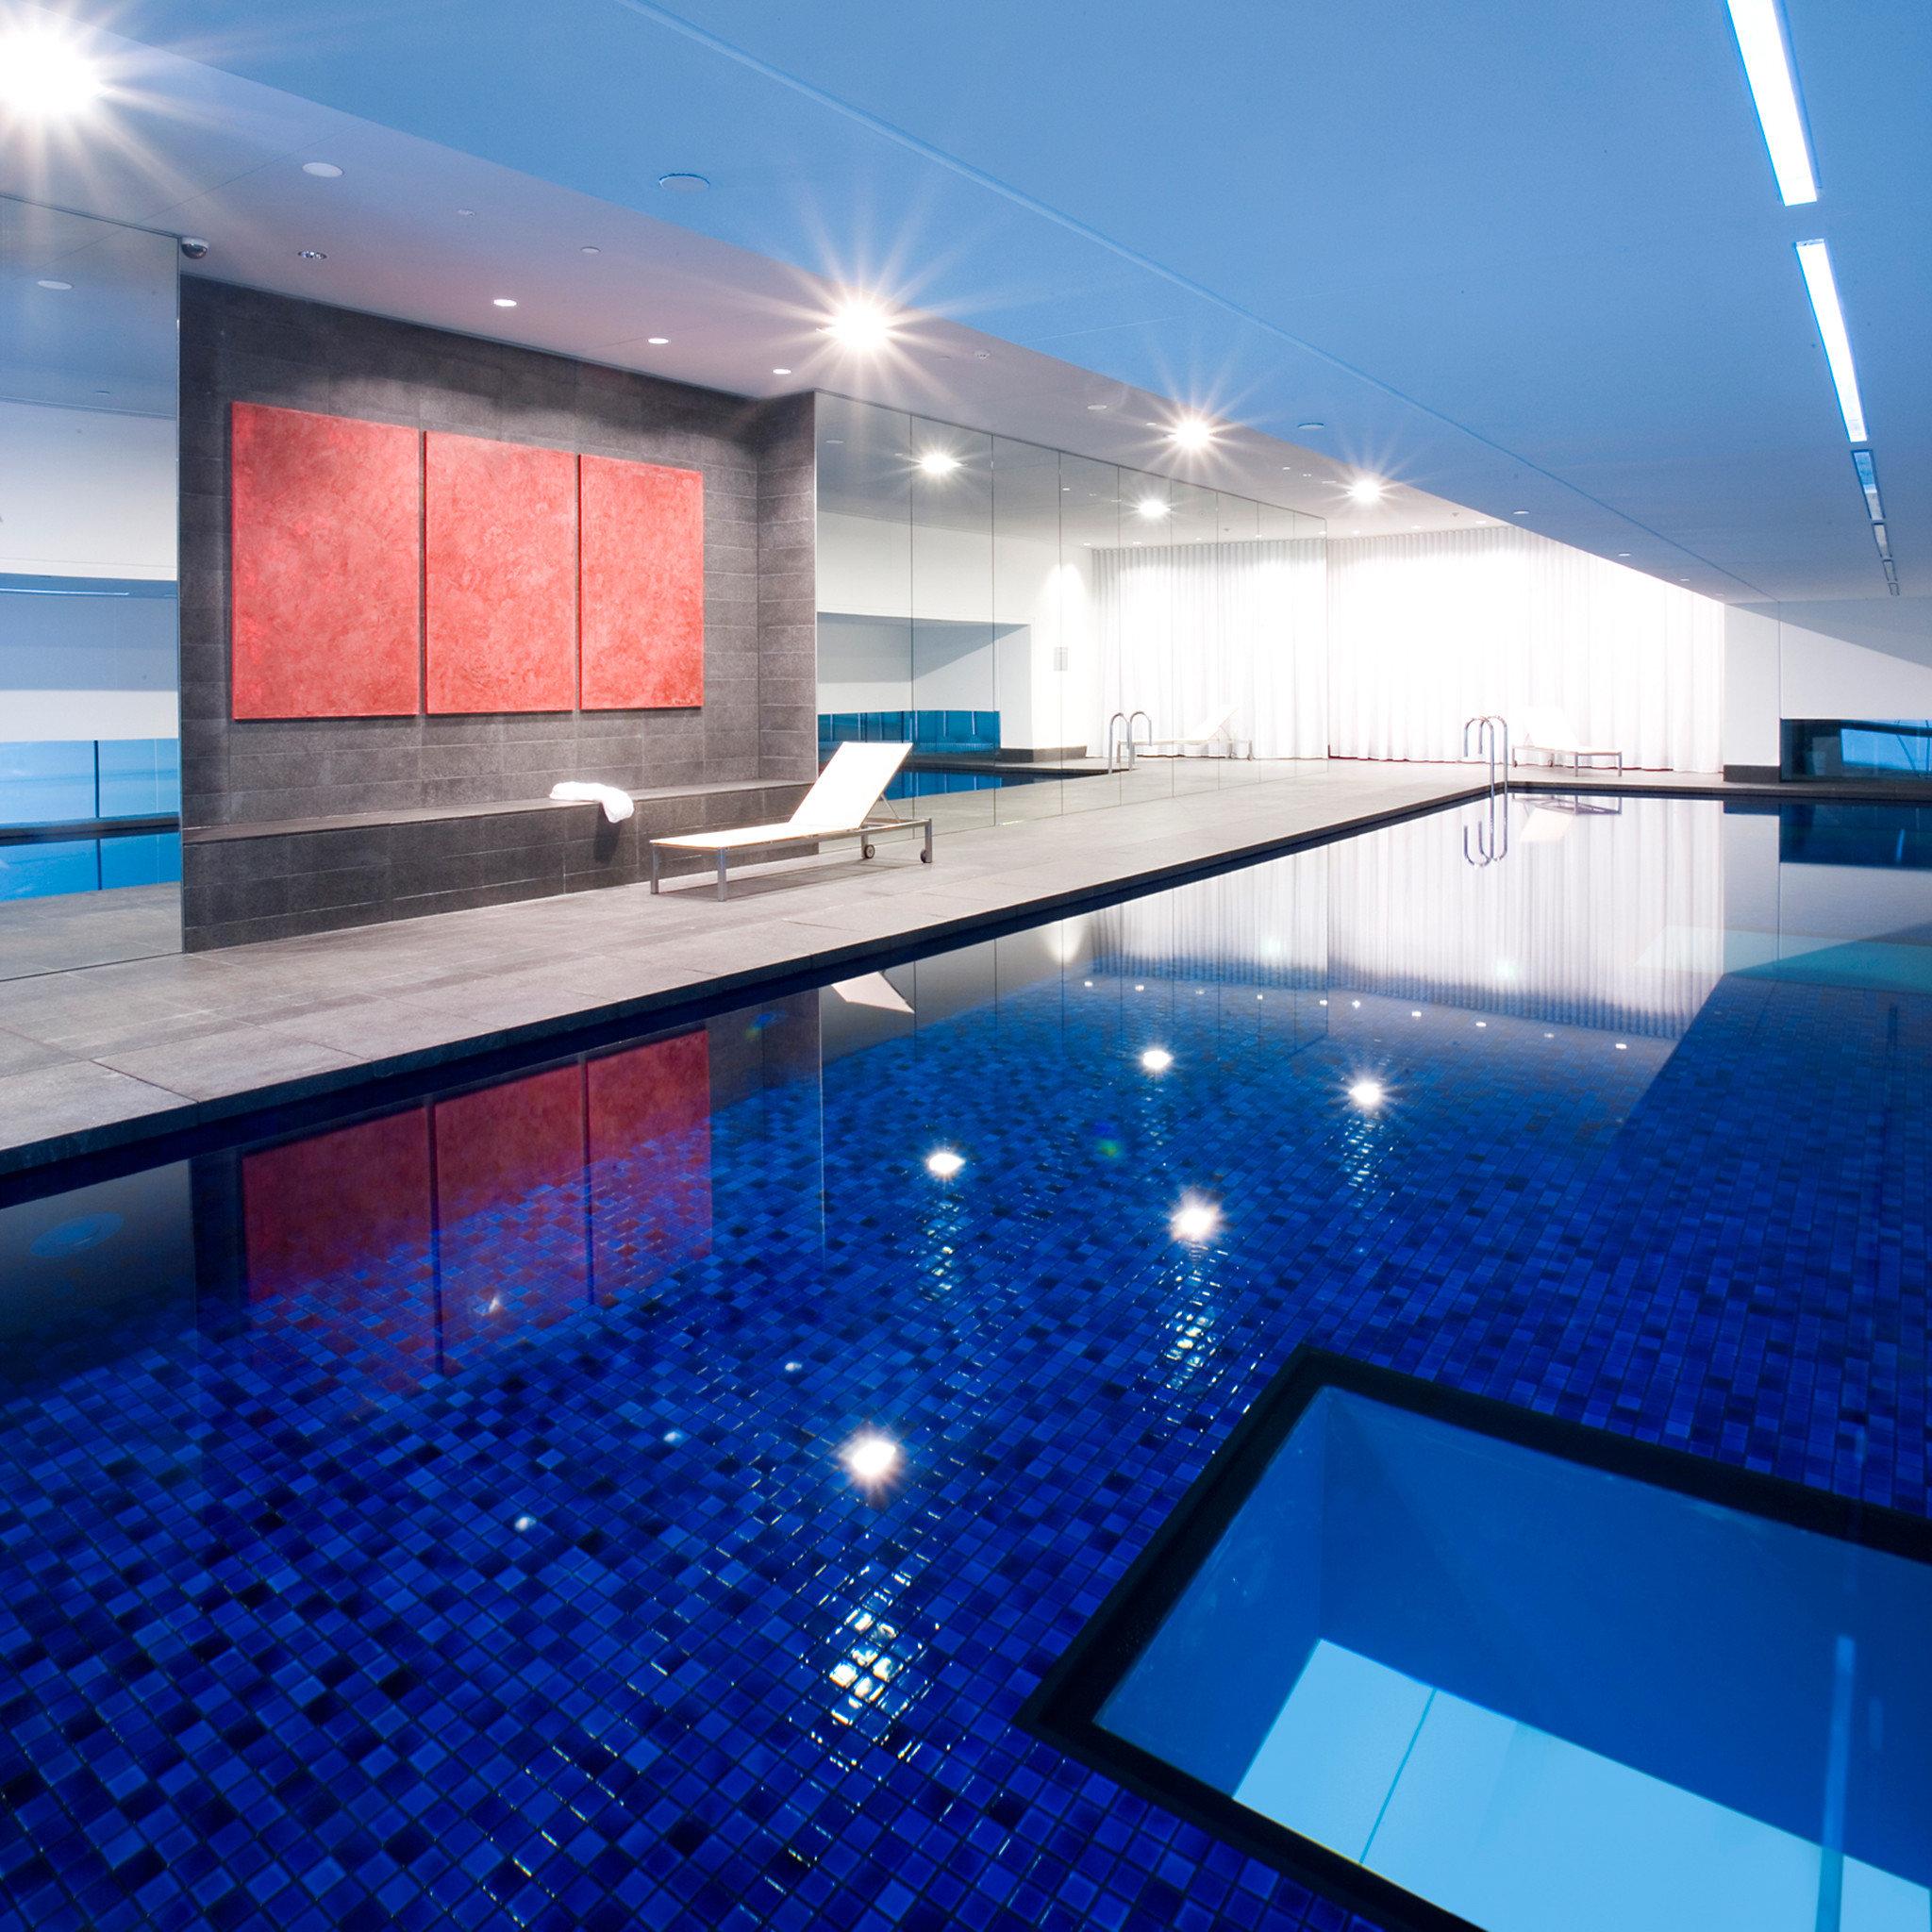 Lounge Luxury Modern Pool sky swimming pool leisure leisure centre lighting light blue day